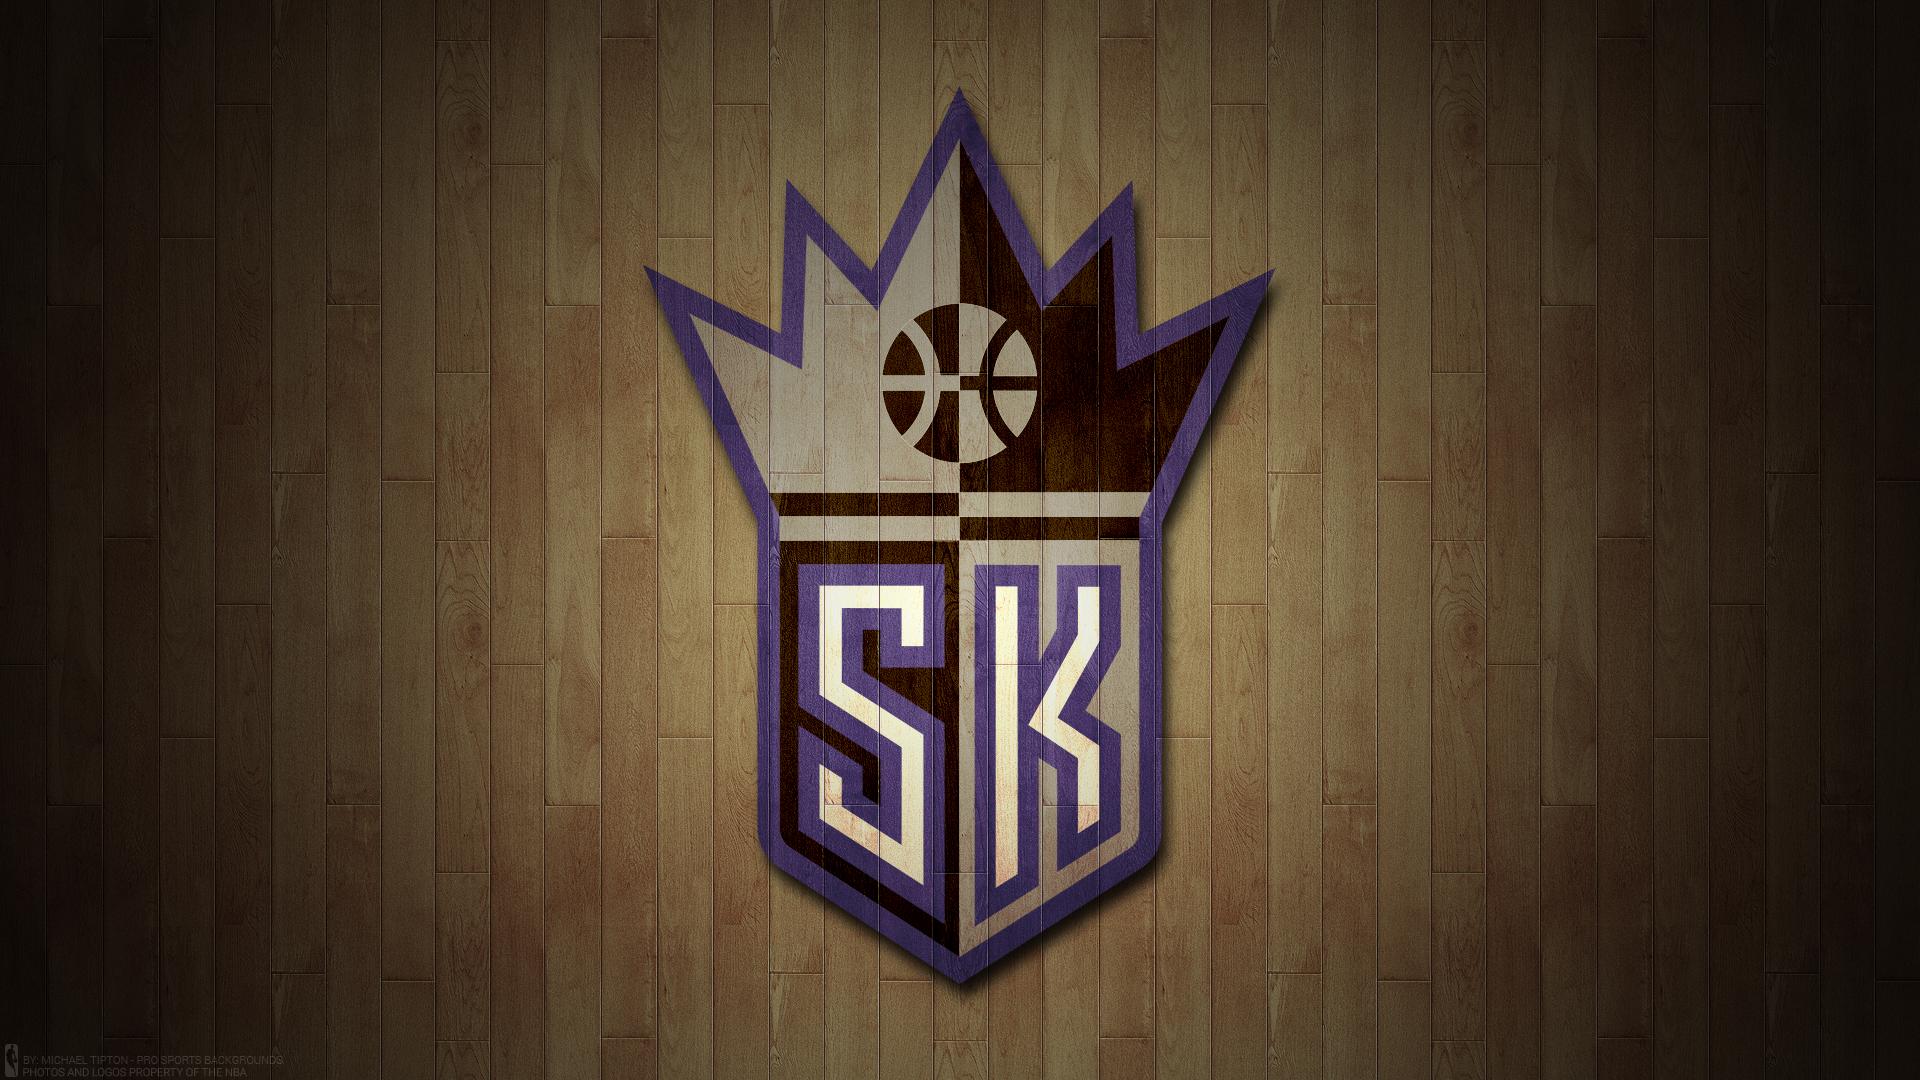 Sacramento Kings HD Wallpaper Background Image 1920x1080 ID 1920x1080